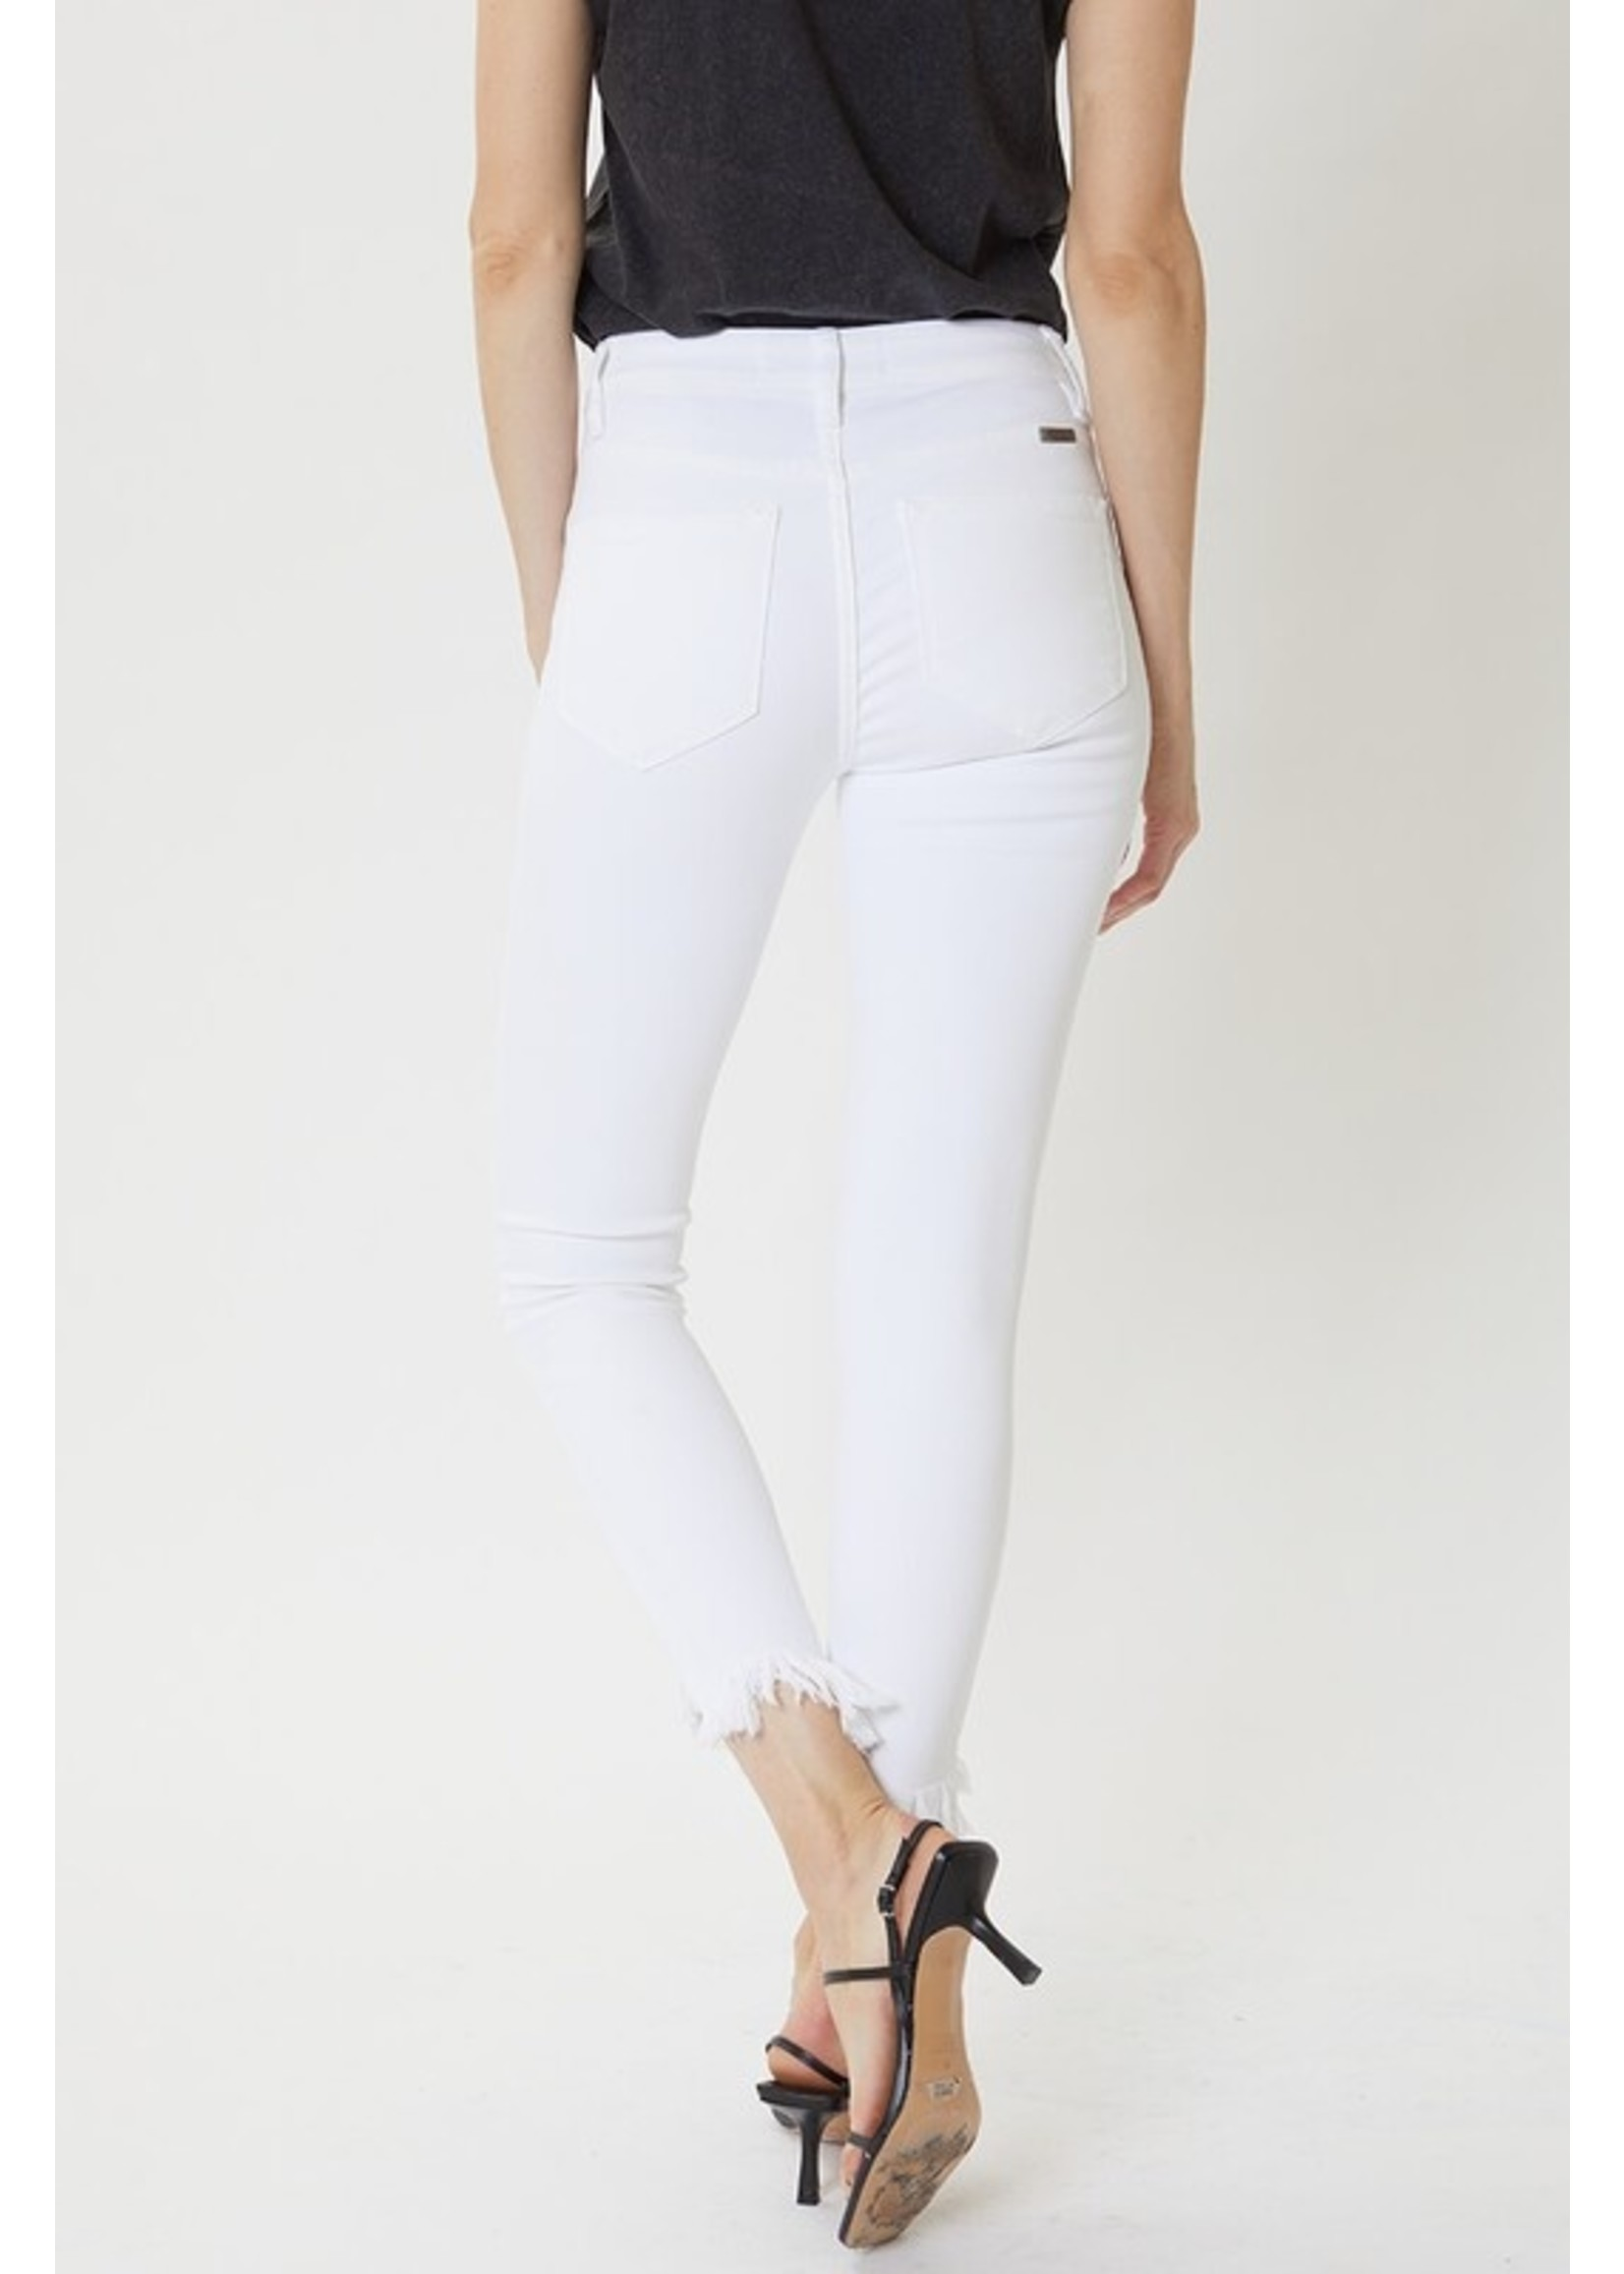 KanCan High-Rise Super Skinny Jean